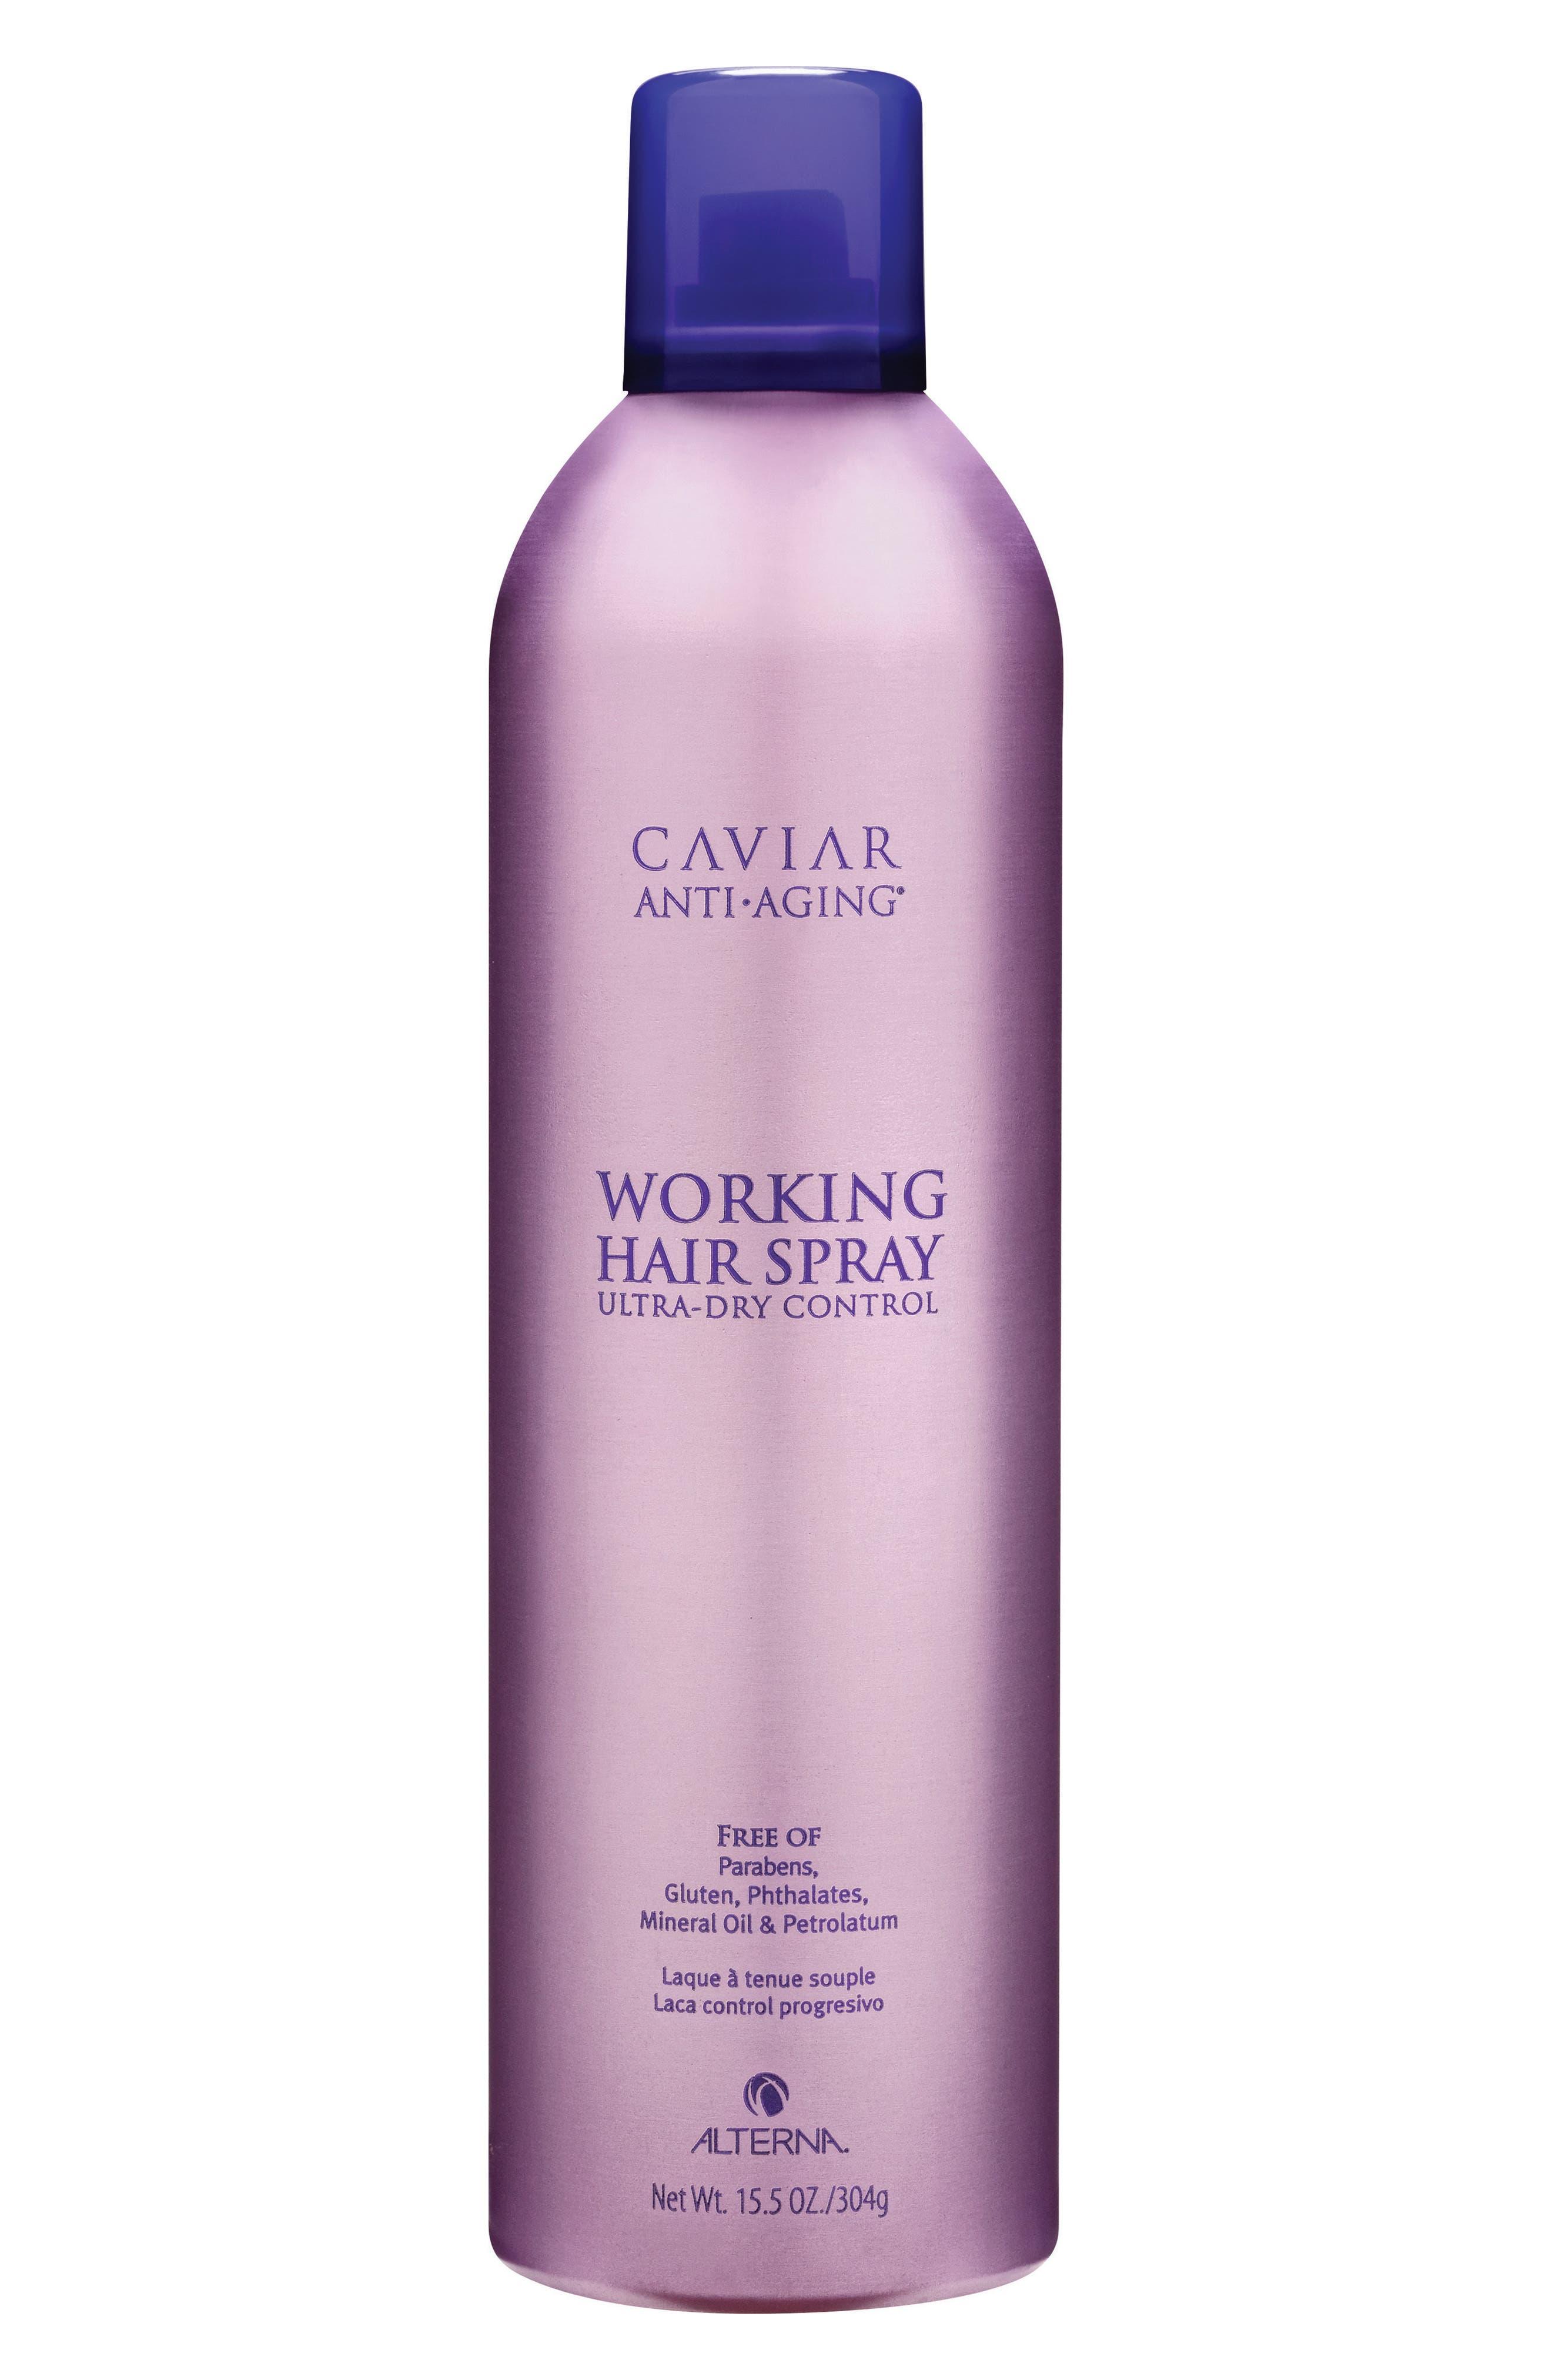 ALTERNA<SUP>®</SUP>, Caviar Anti-Aging Working Hair Spray, Alternate thumbnail 2, color, 000